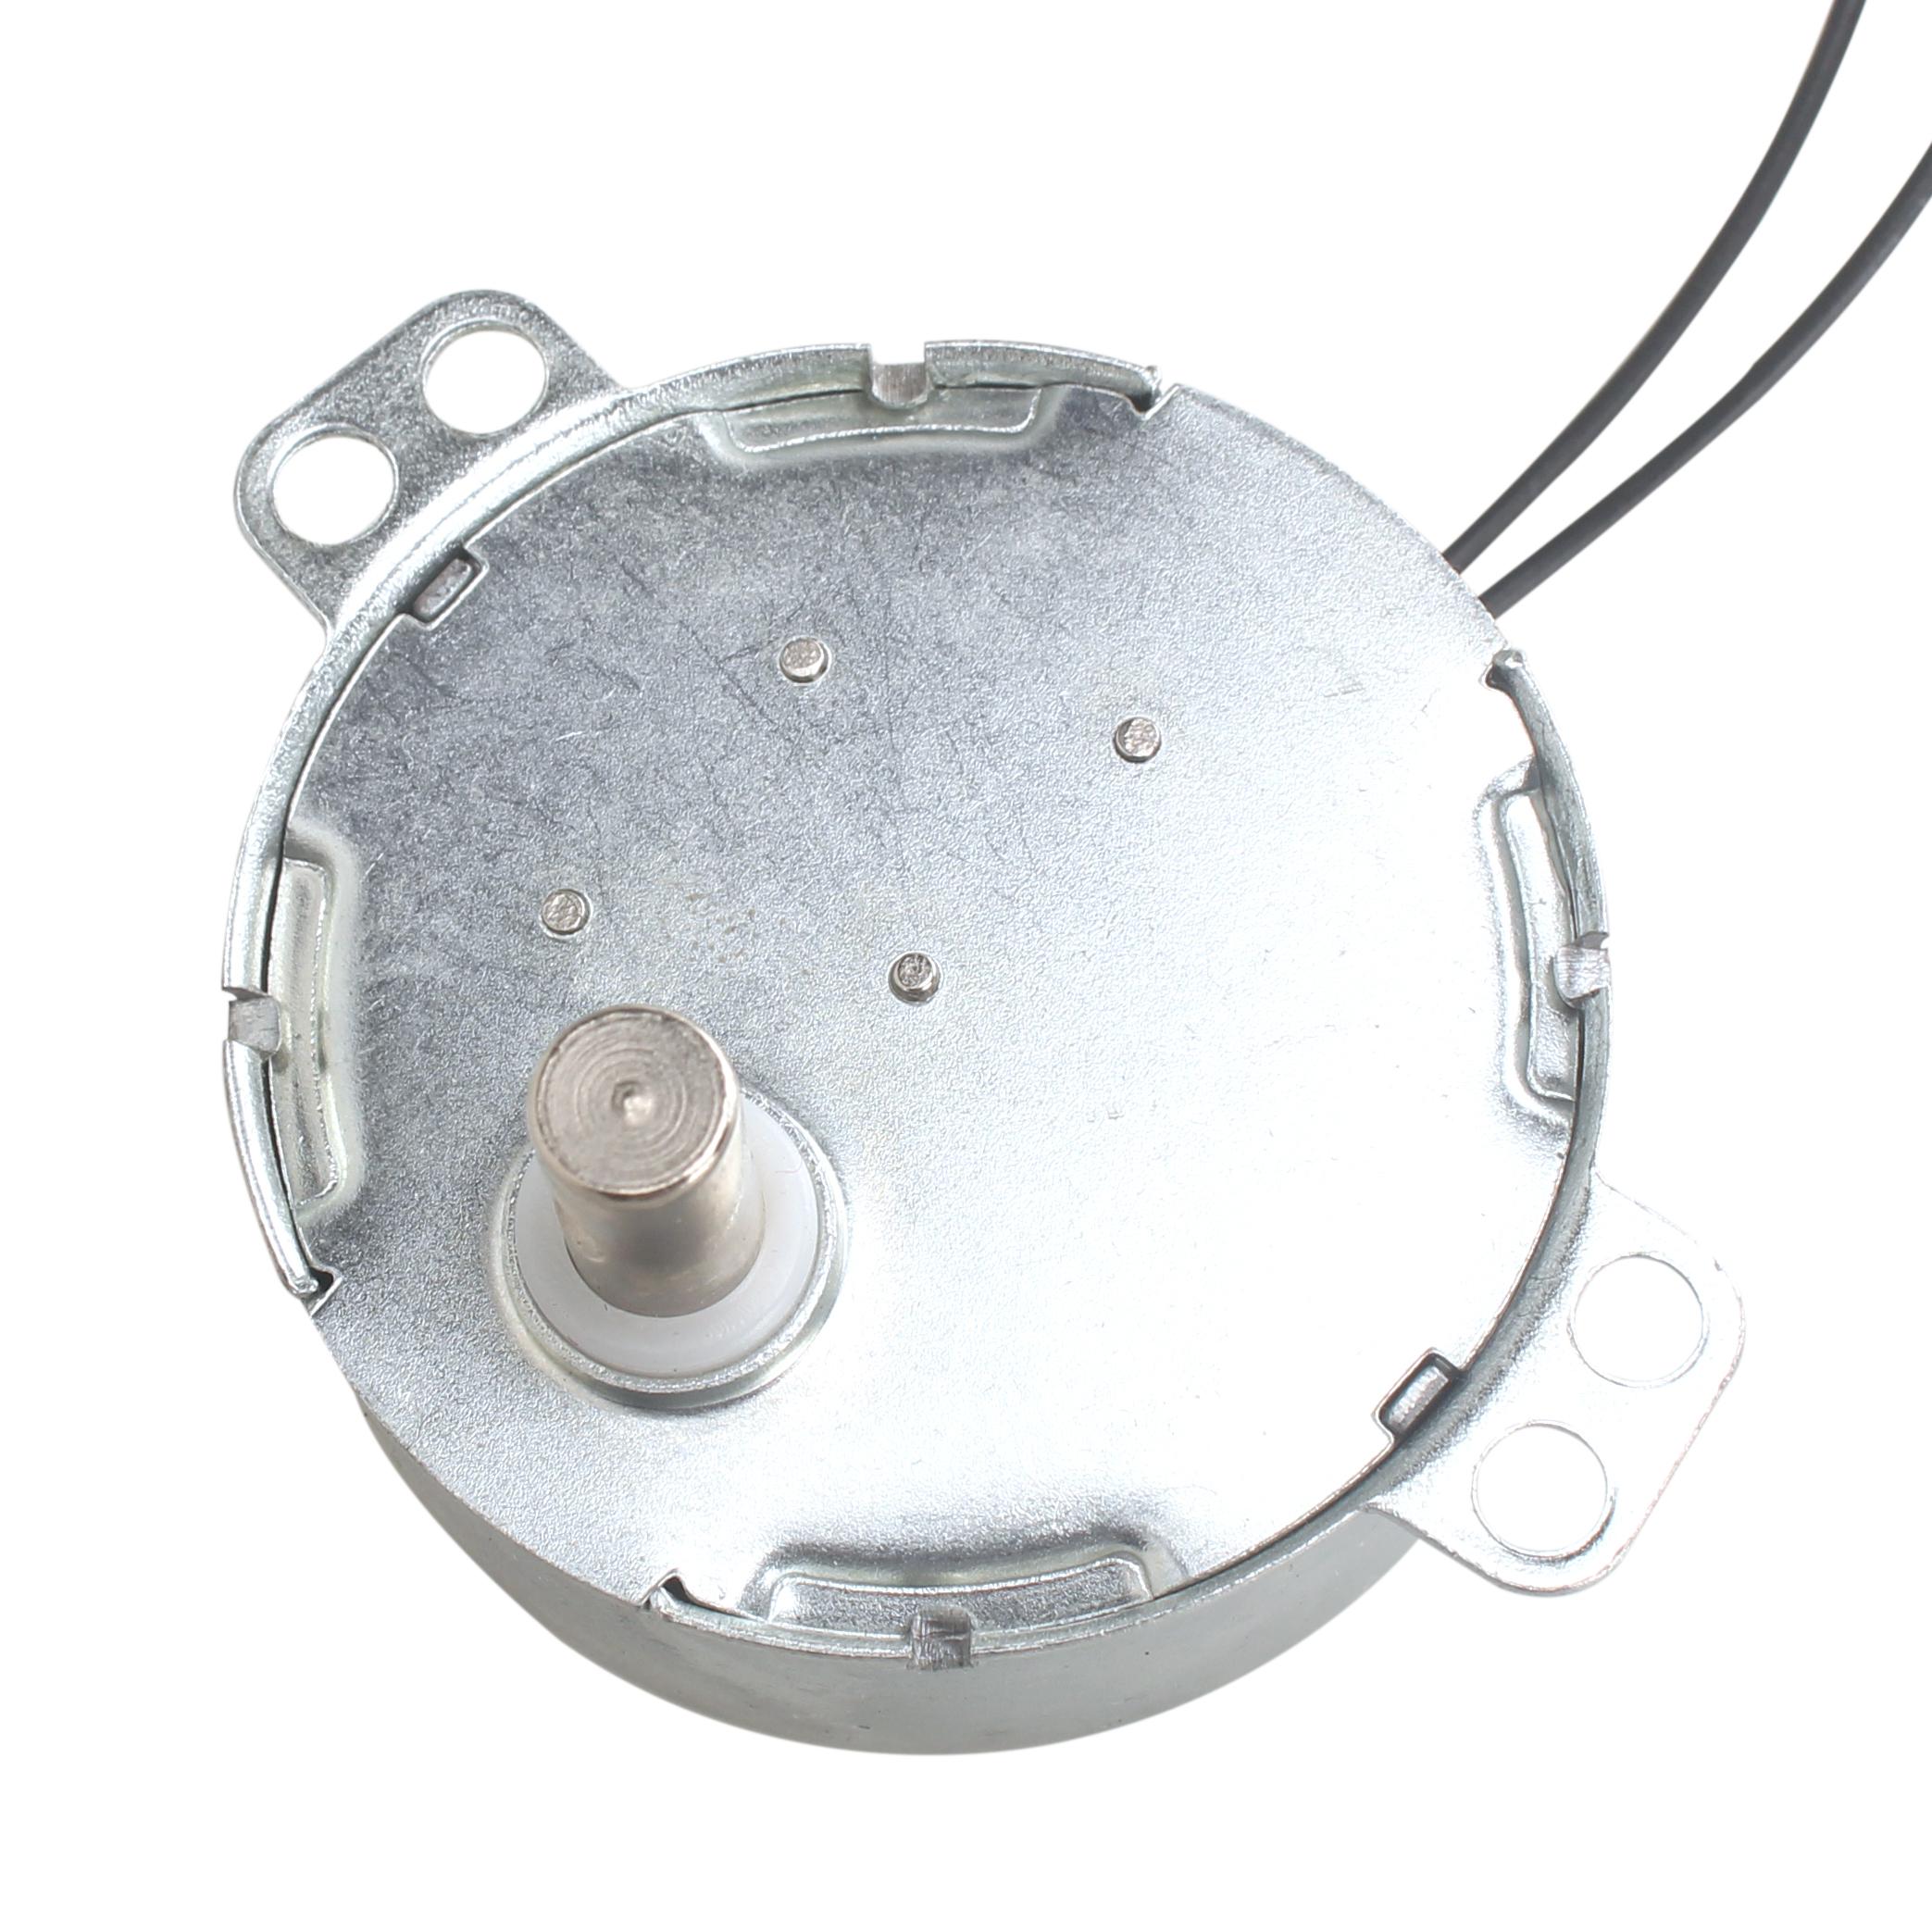 synchronous motor small electric fan motor high speed electric table fan parts table fan motor